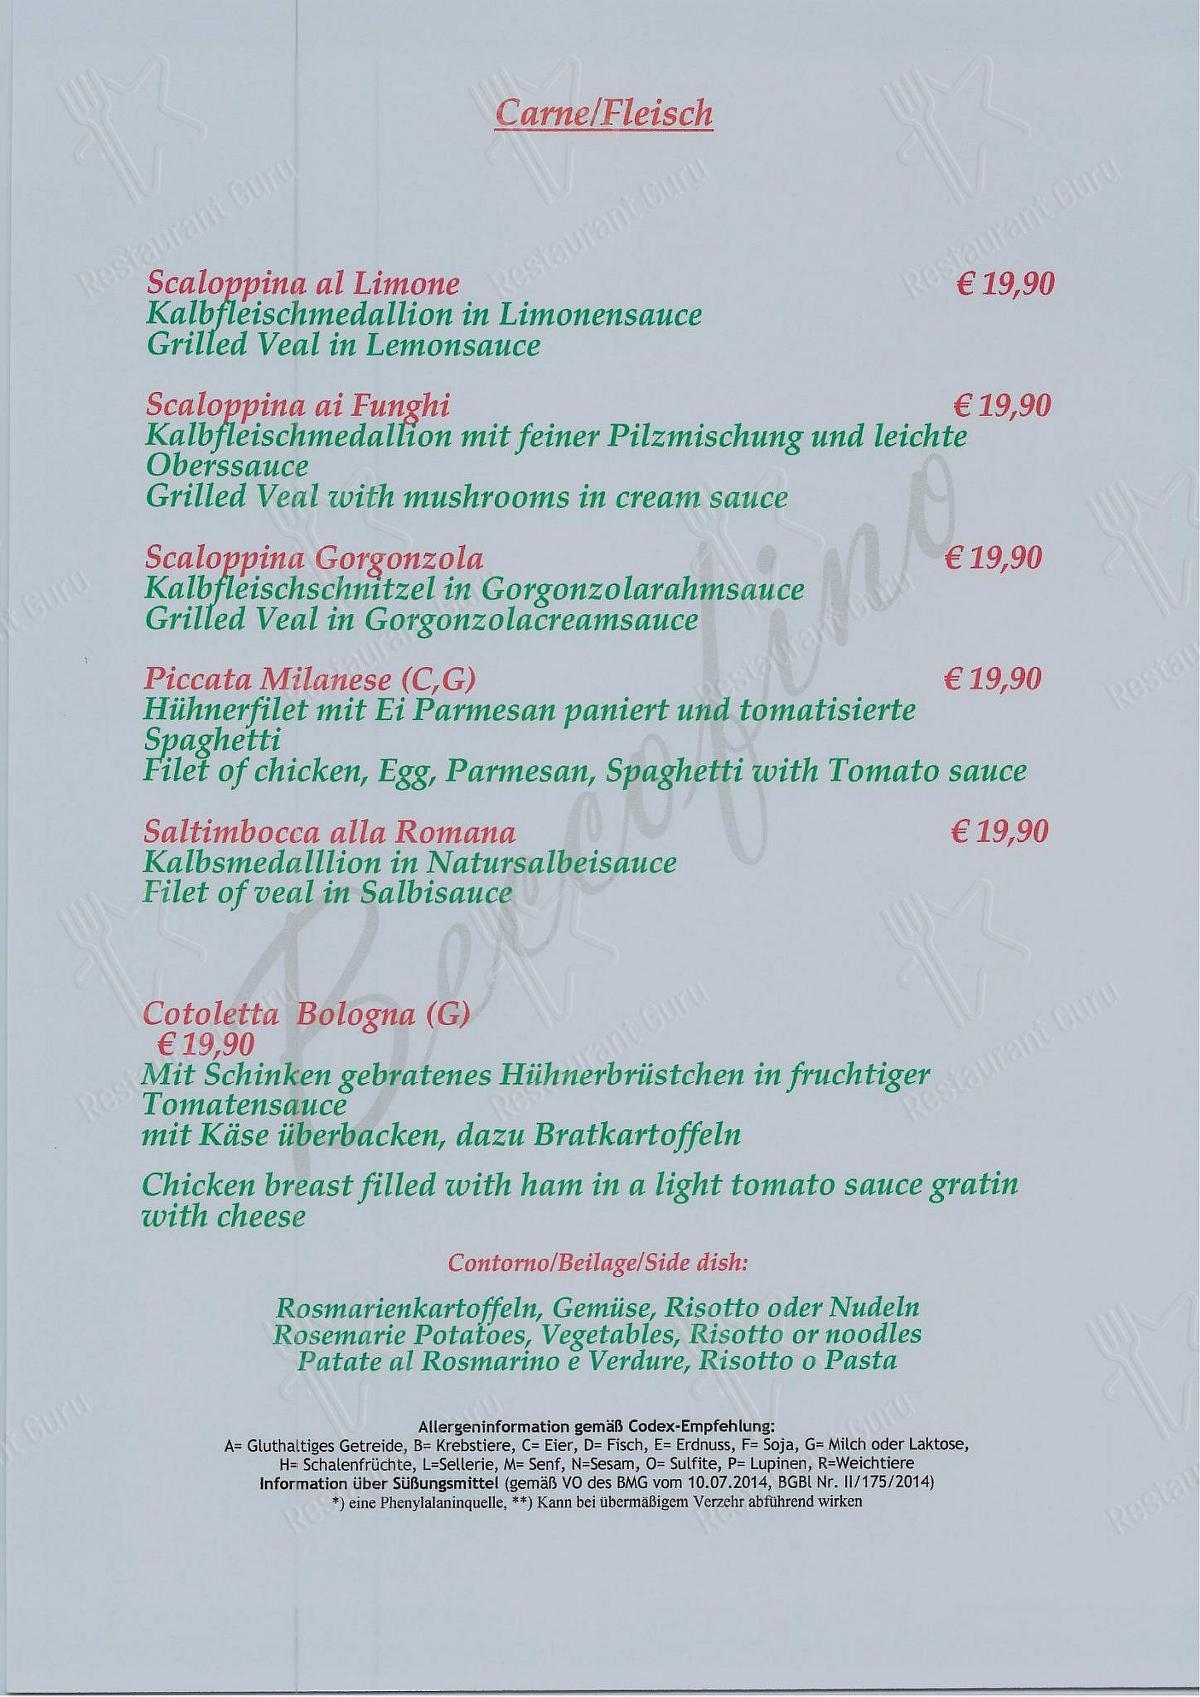 Ristorante Beccofino menu - meals and drinks